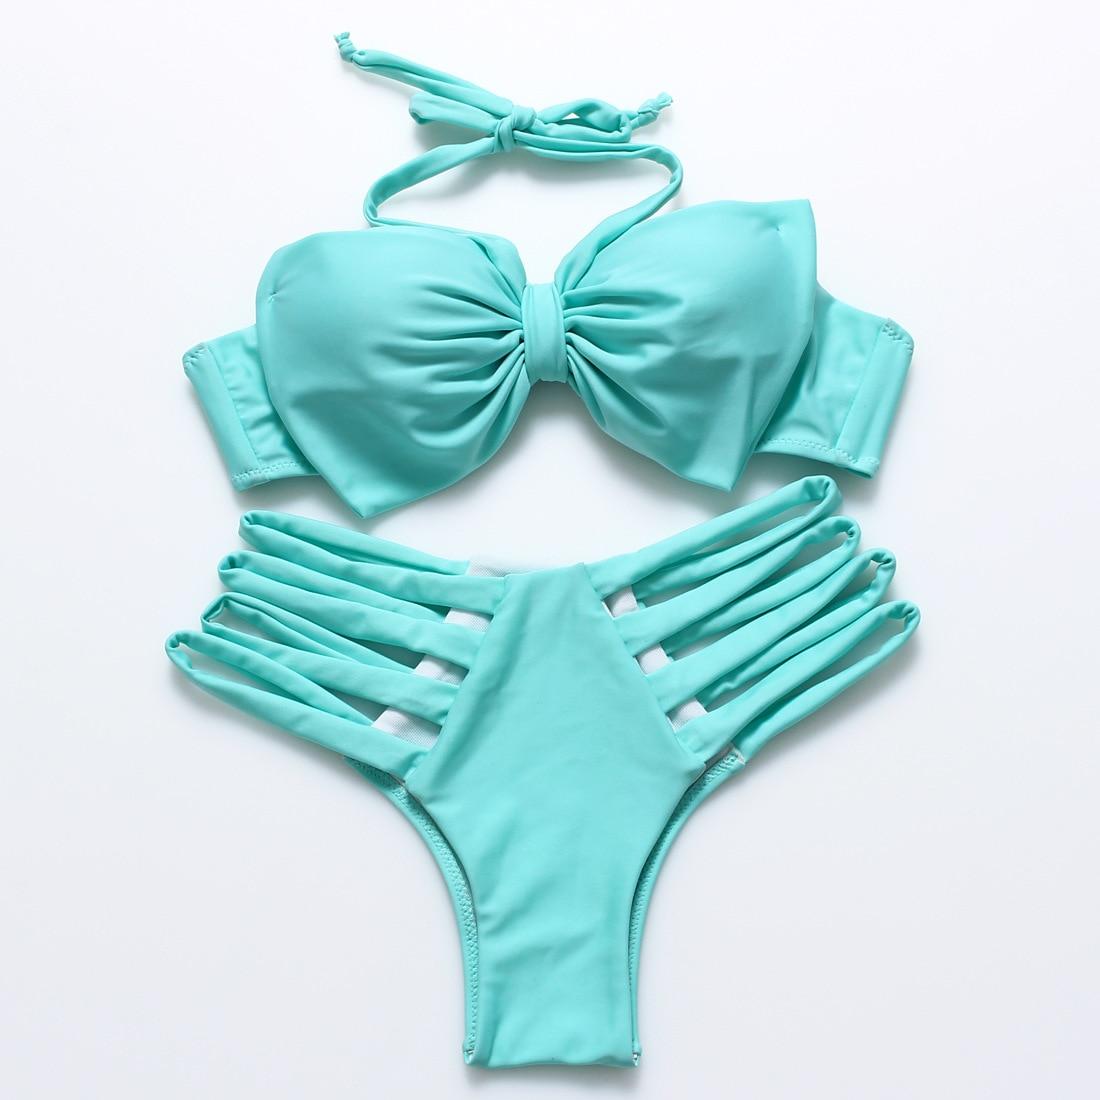 ФОТО Wholesale Bikini Set Bandage Swimsuit Women Solid Polyester Low Waist Beachwear Sexy Summer Bathing Suit for Girls